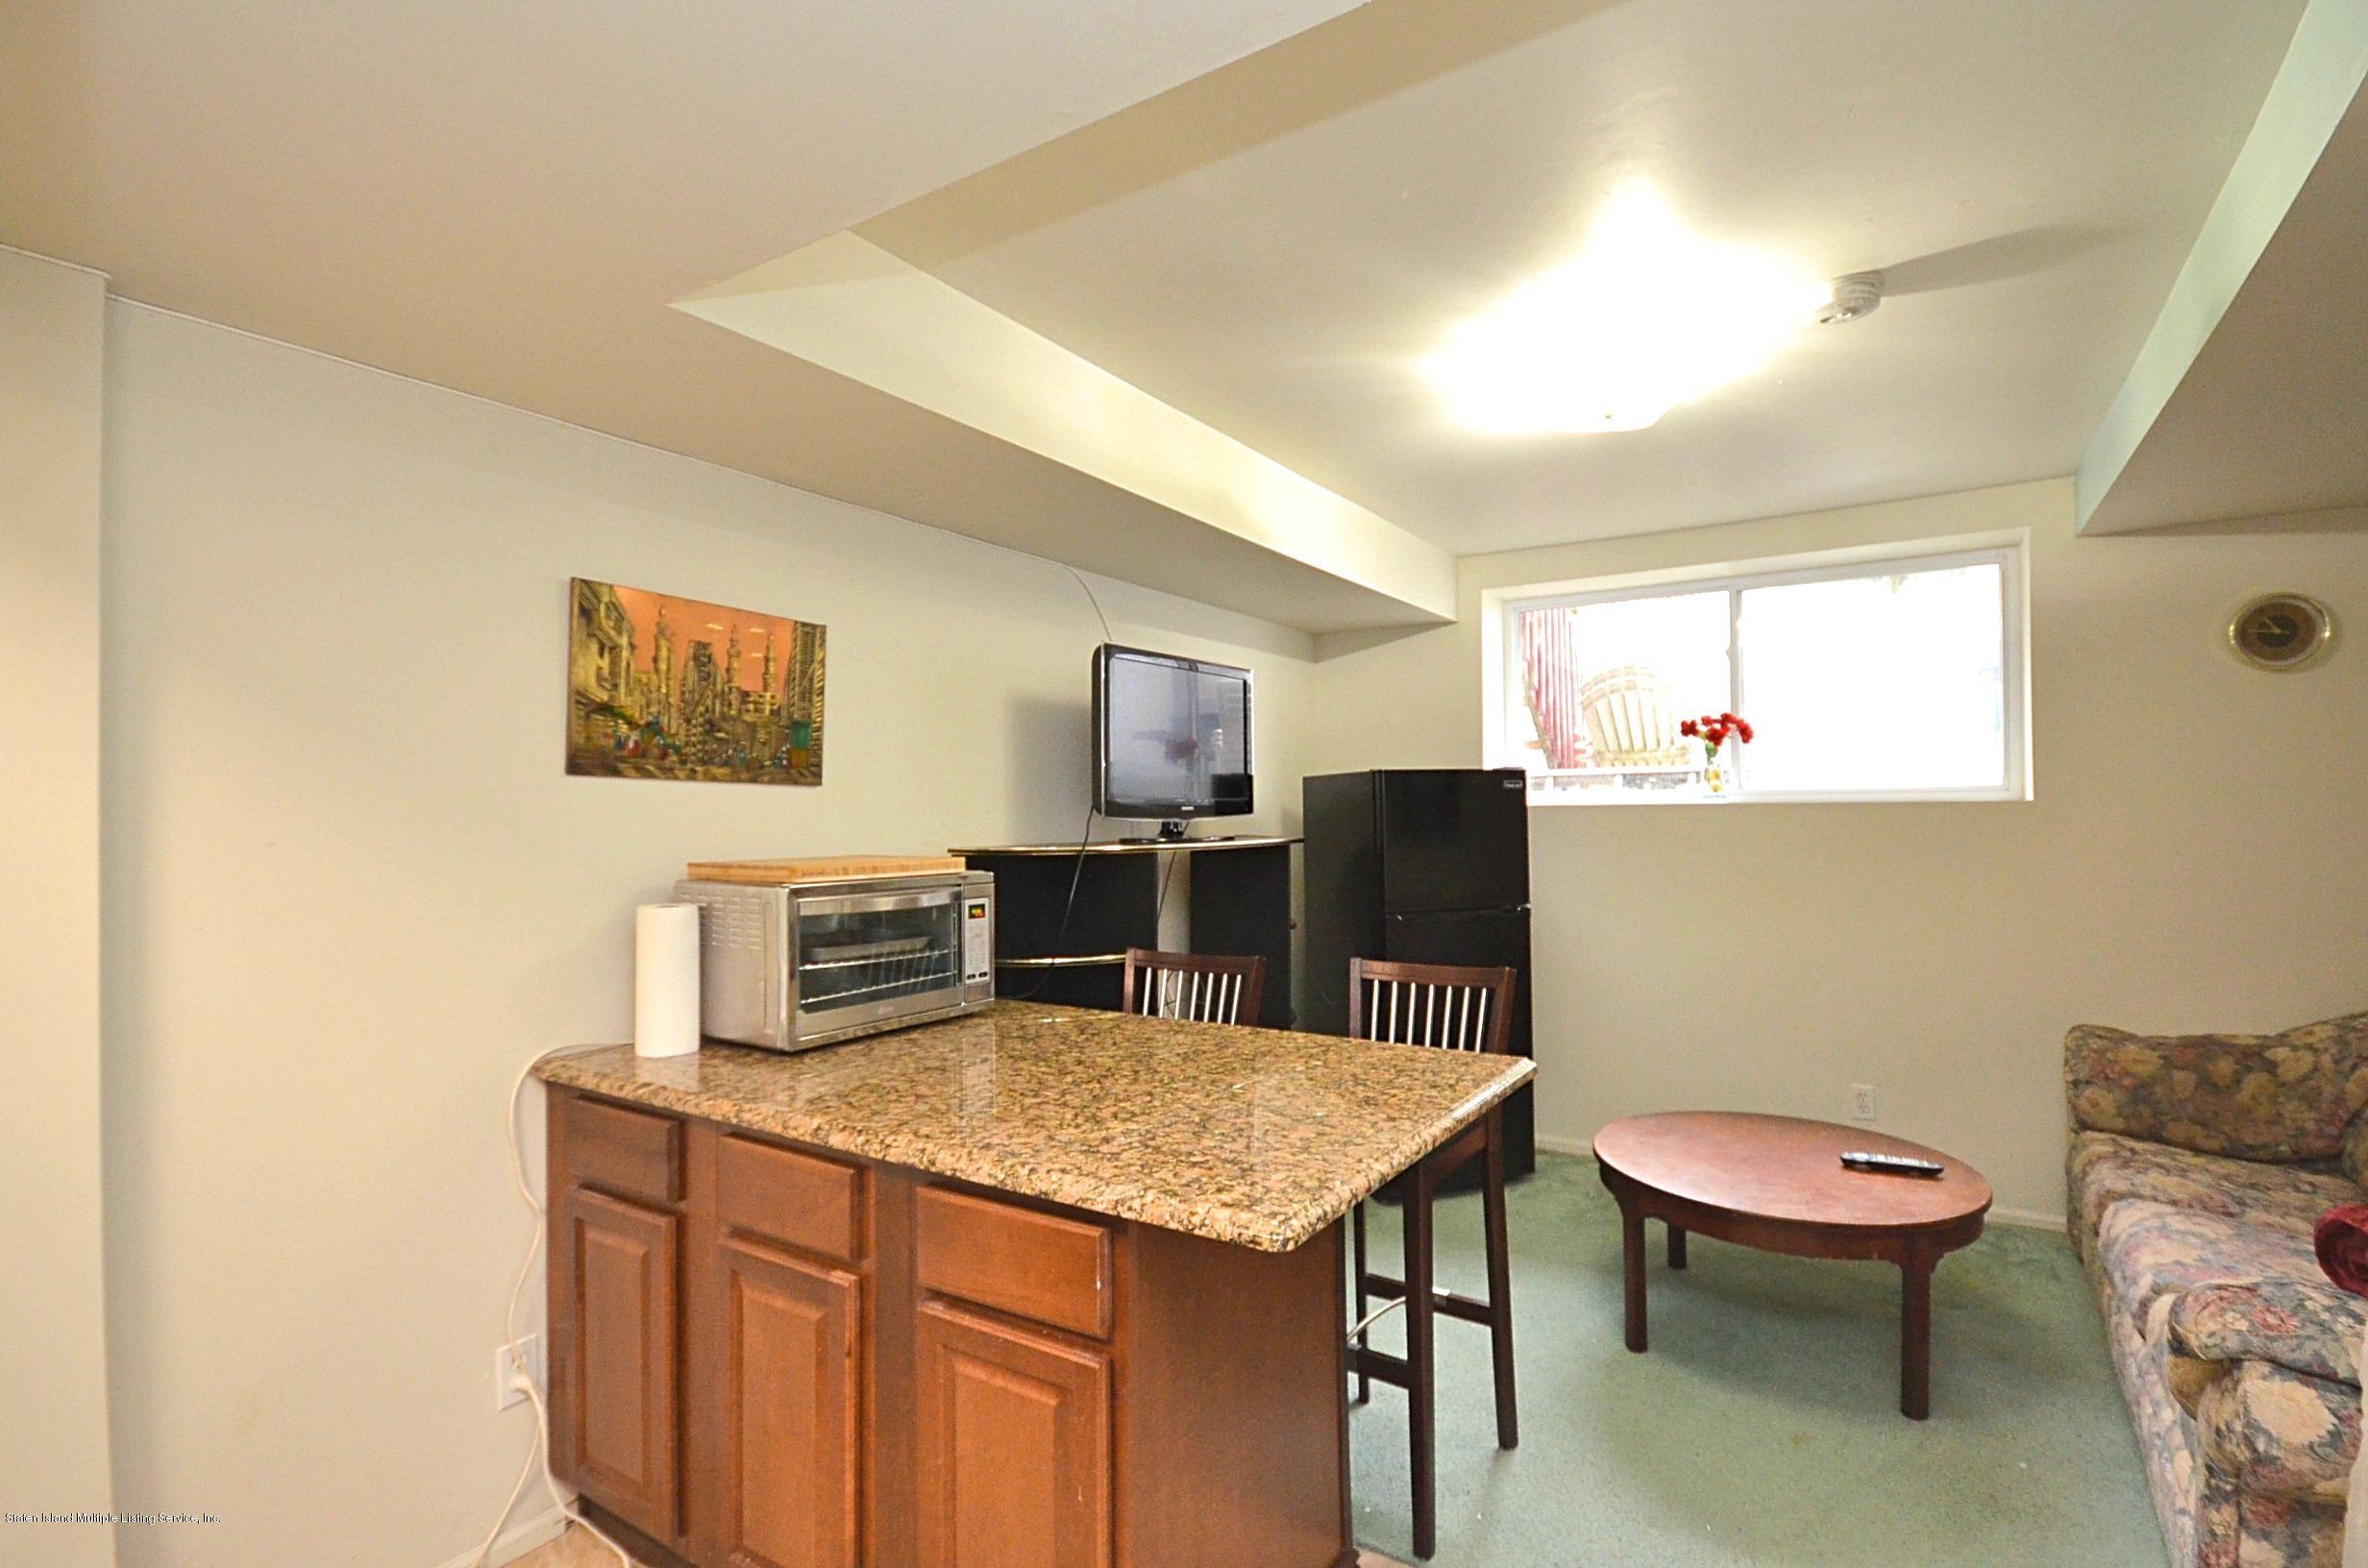 Single Family - Attached 200 Kenilworth Avenue  Staten Island, NY 10312, MLS-1124636-7